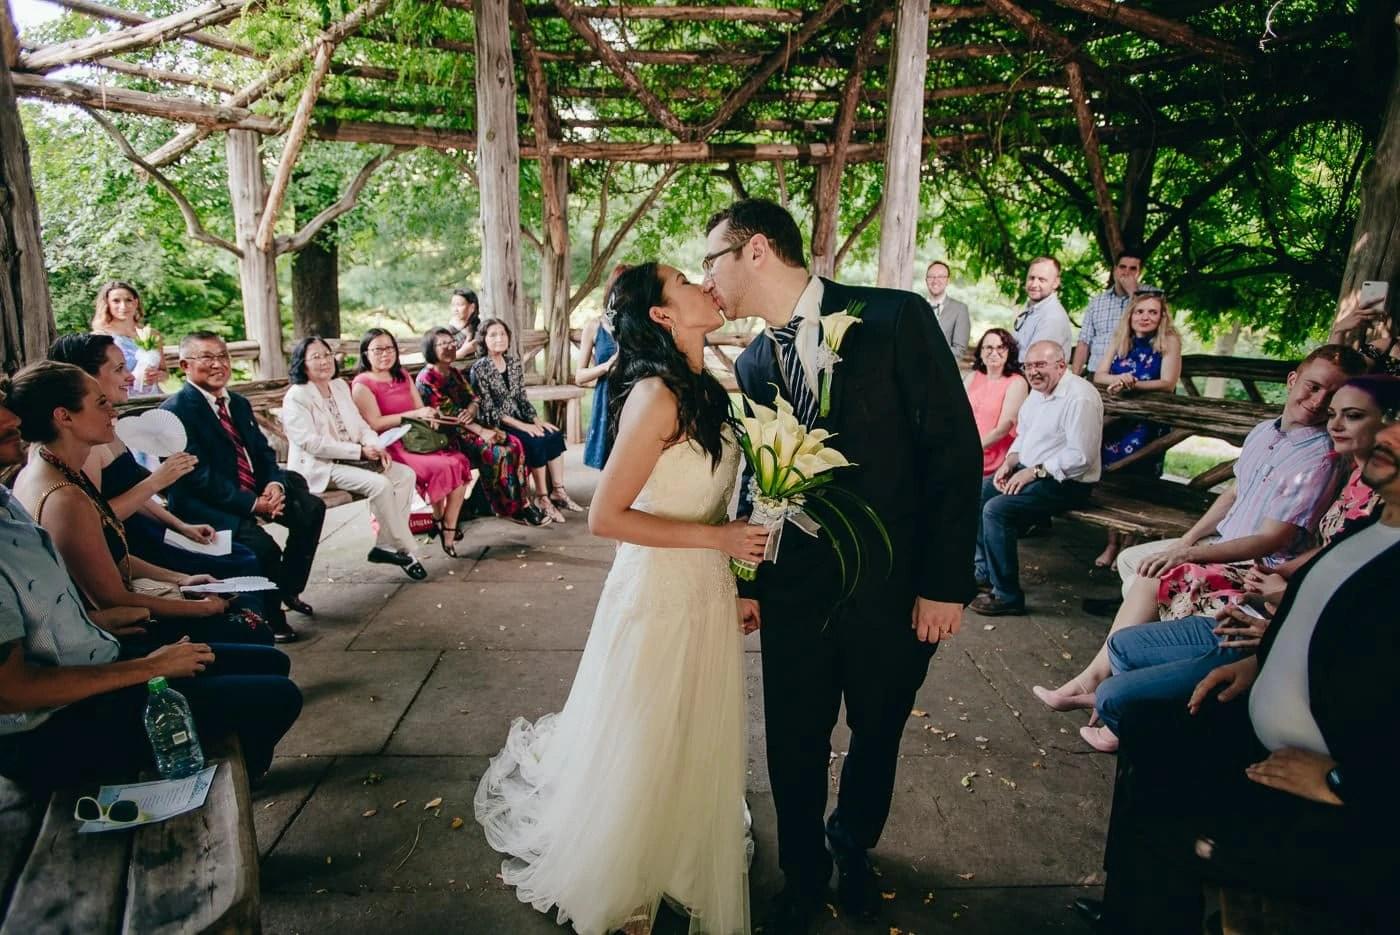 Central Park Cop Cot Wedding